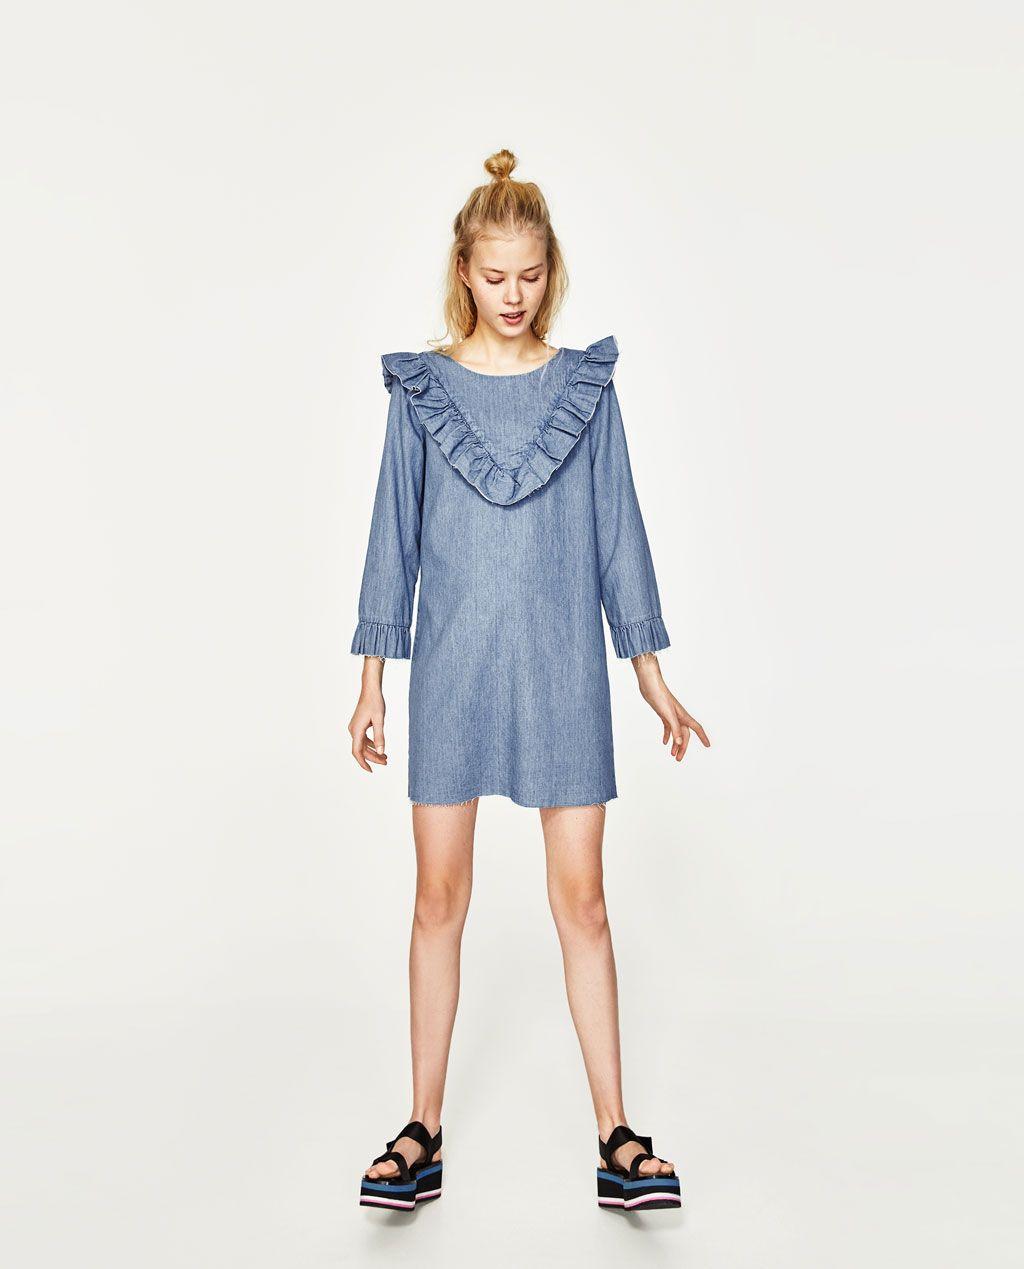 9675c846dd Image 1 of FRILLED DENIM DRESS from Zara | Shopping List | Dresses ...